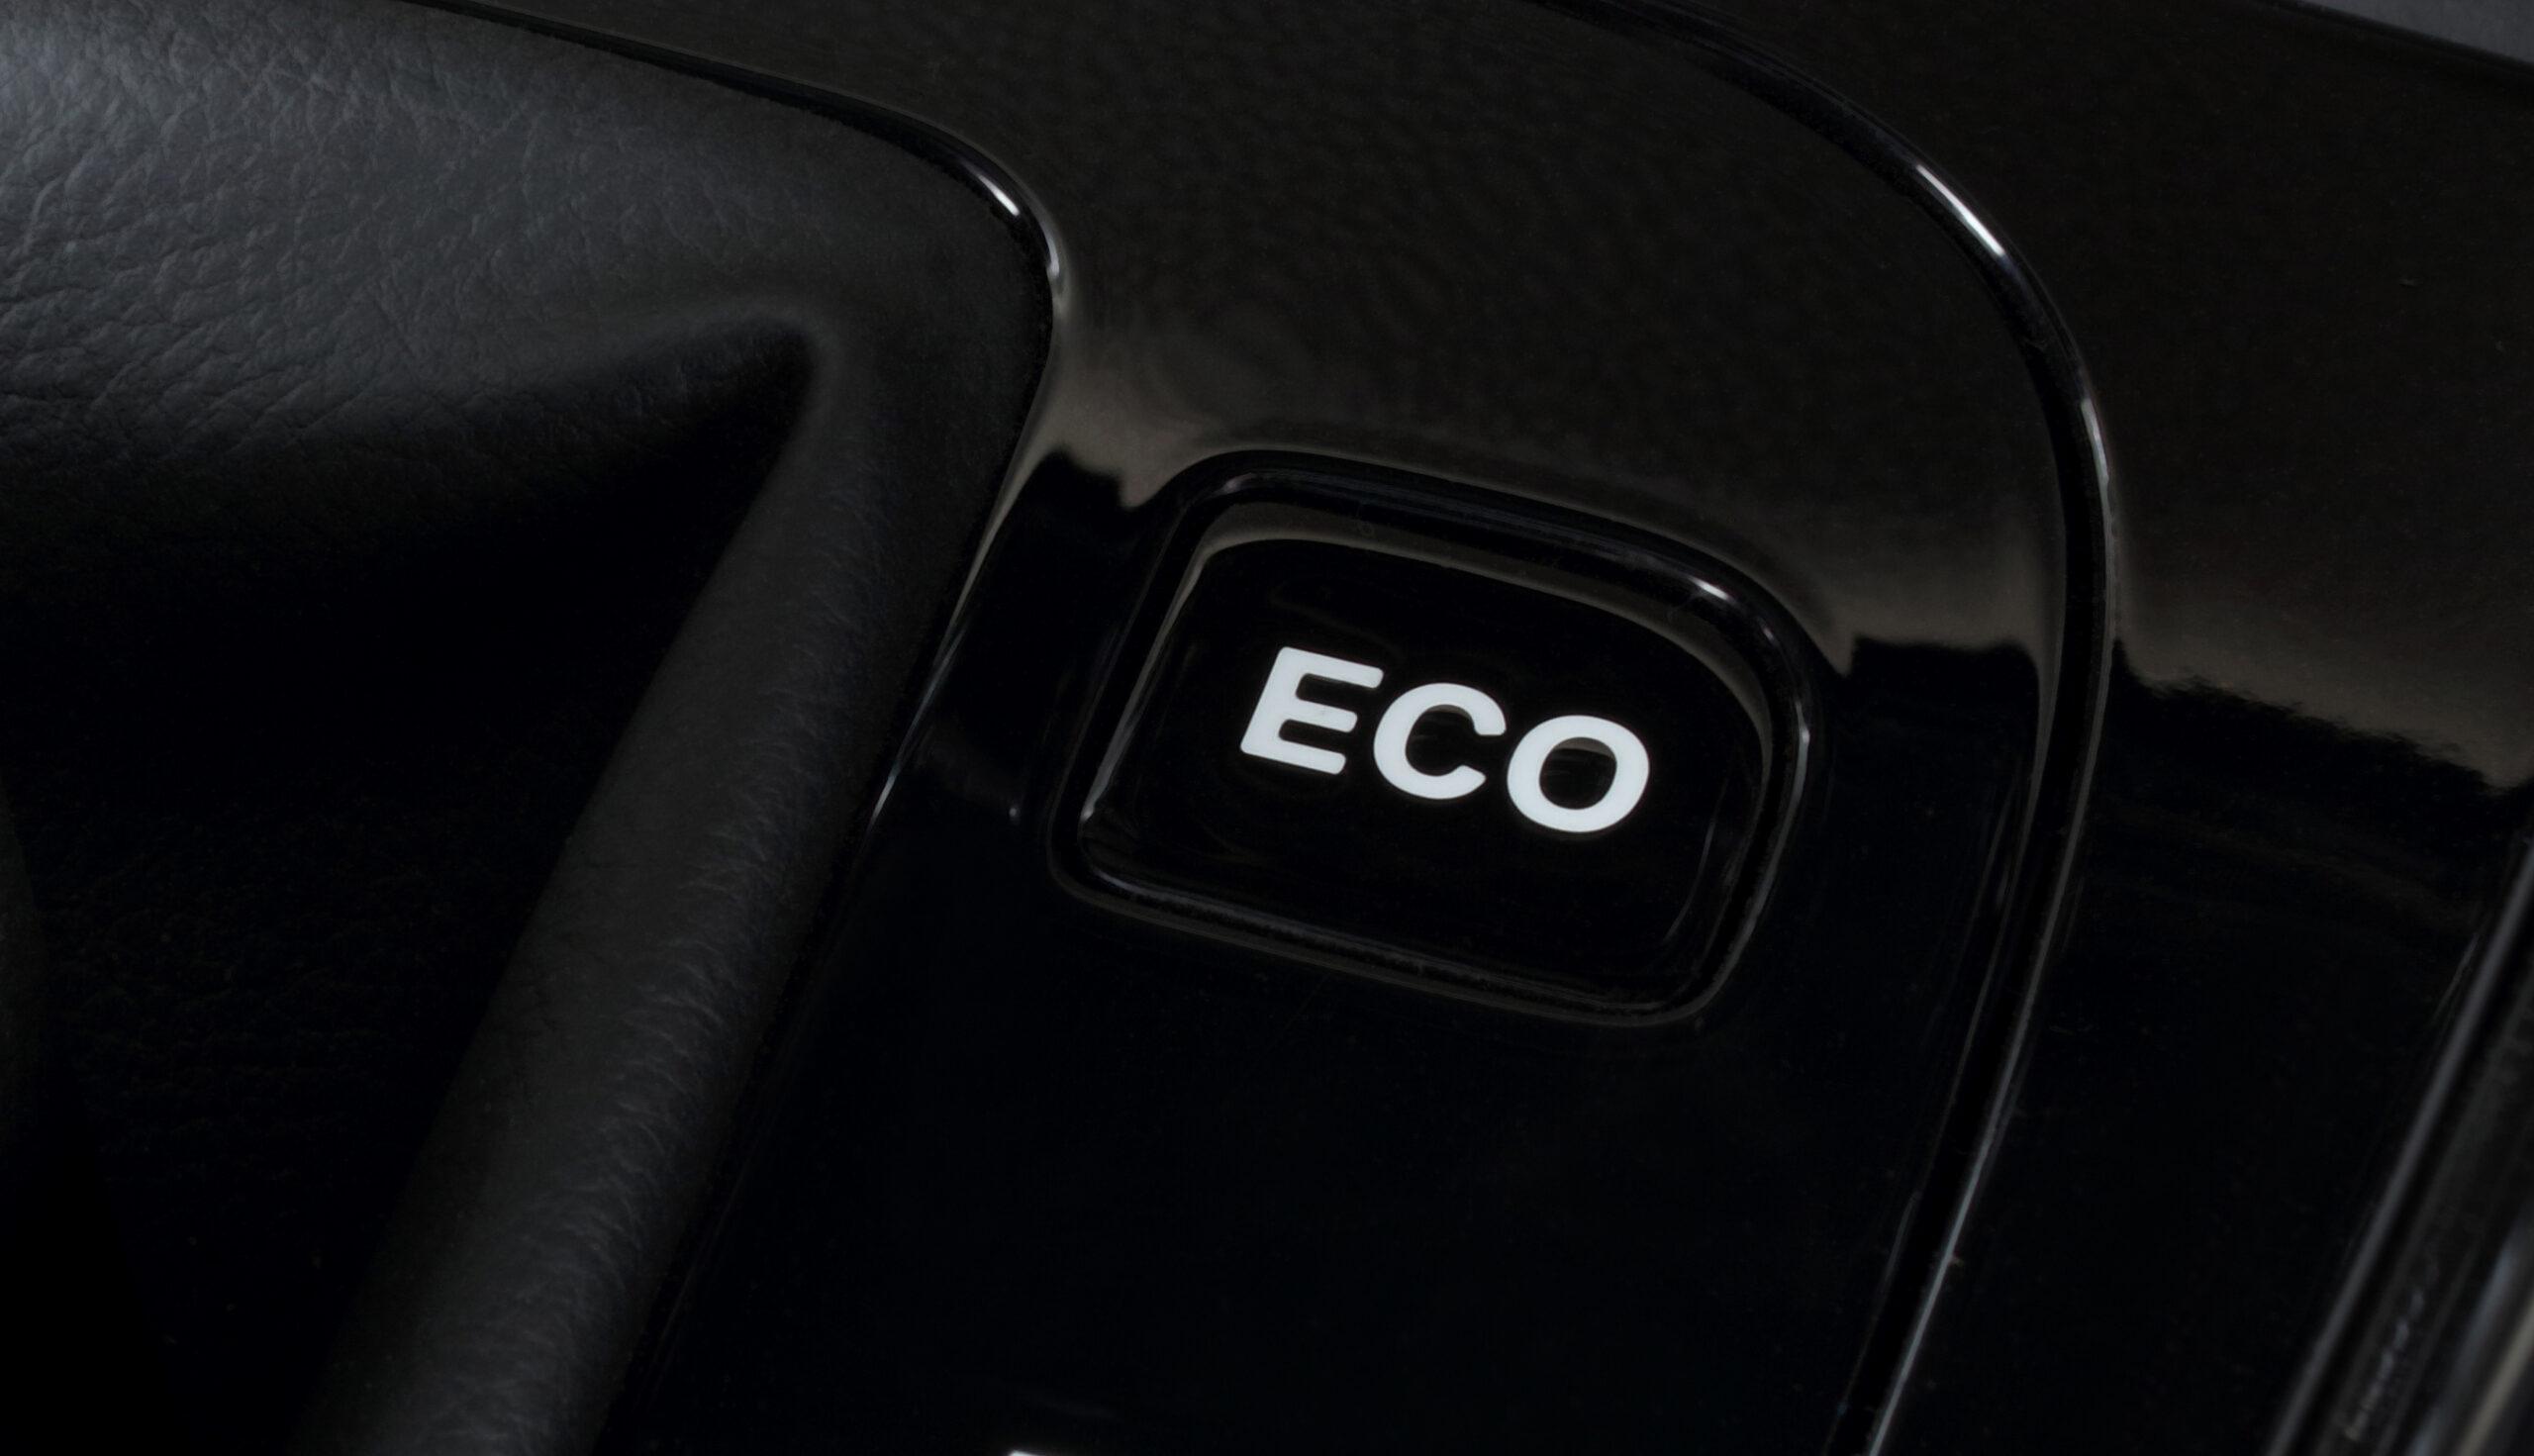 2021 MG Hector Petrol CVT Automatic (1)